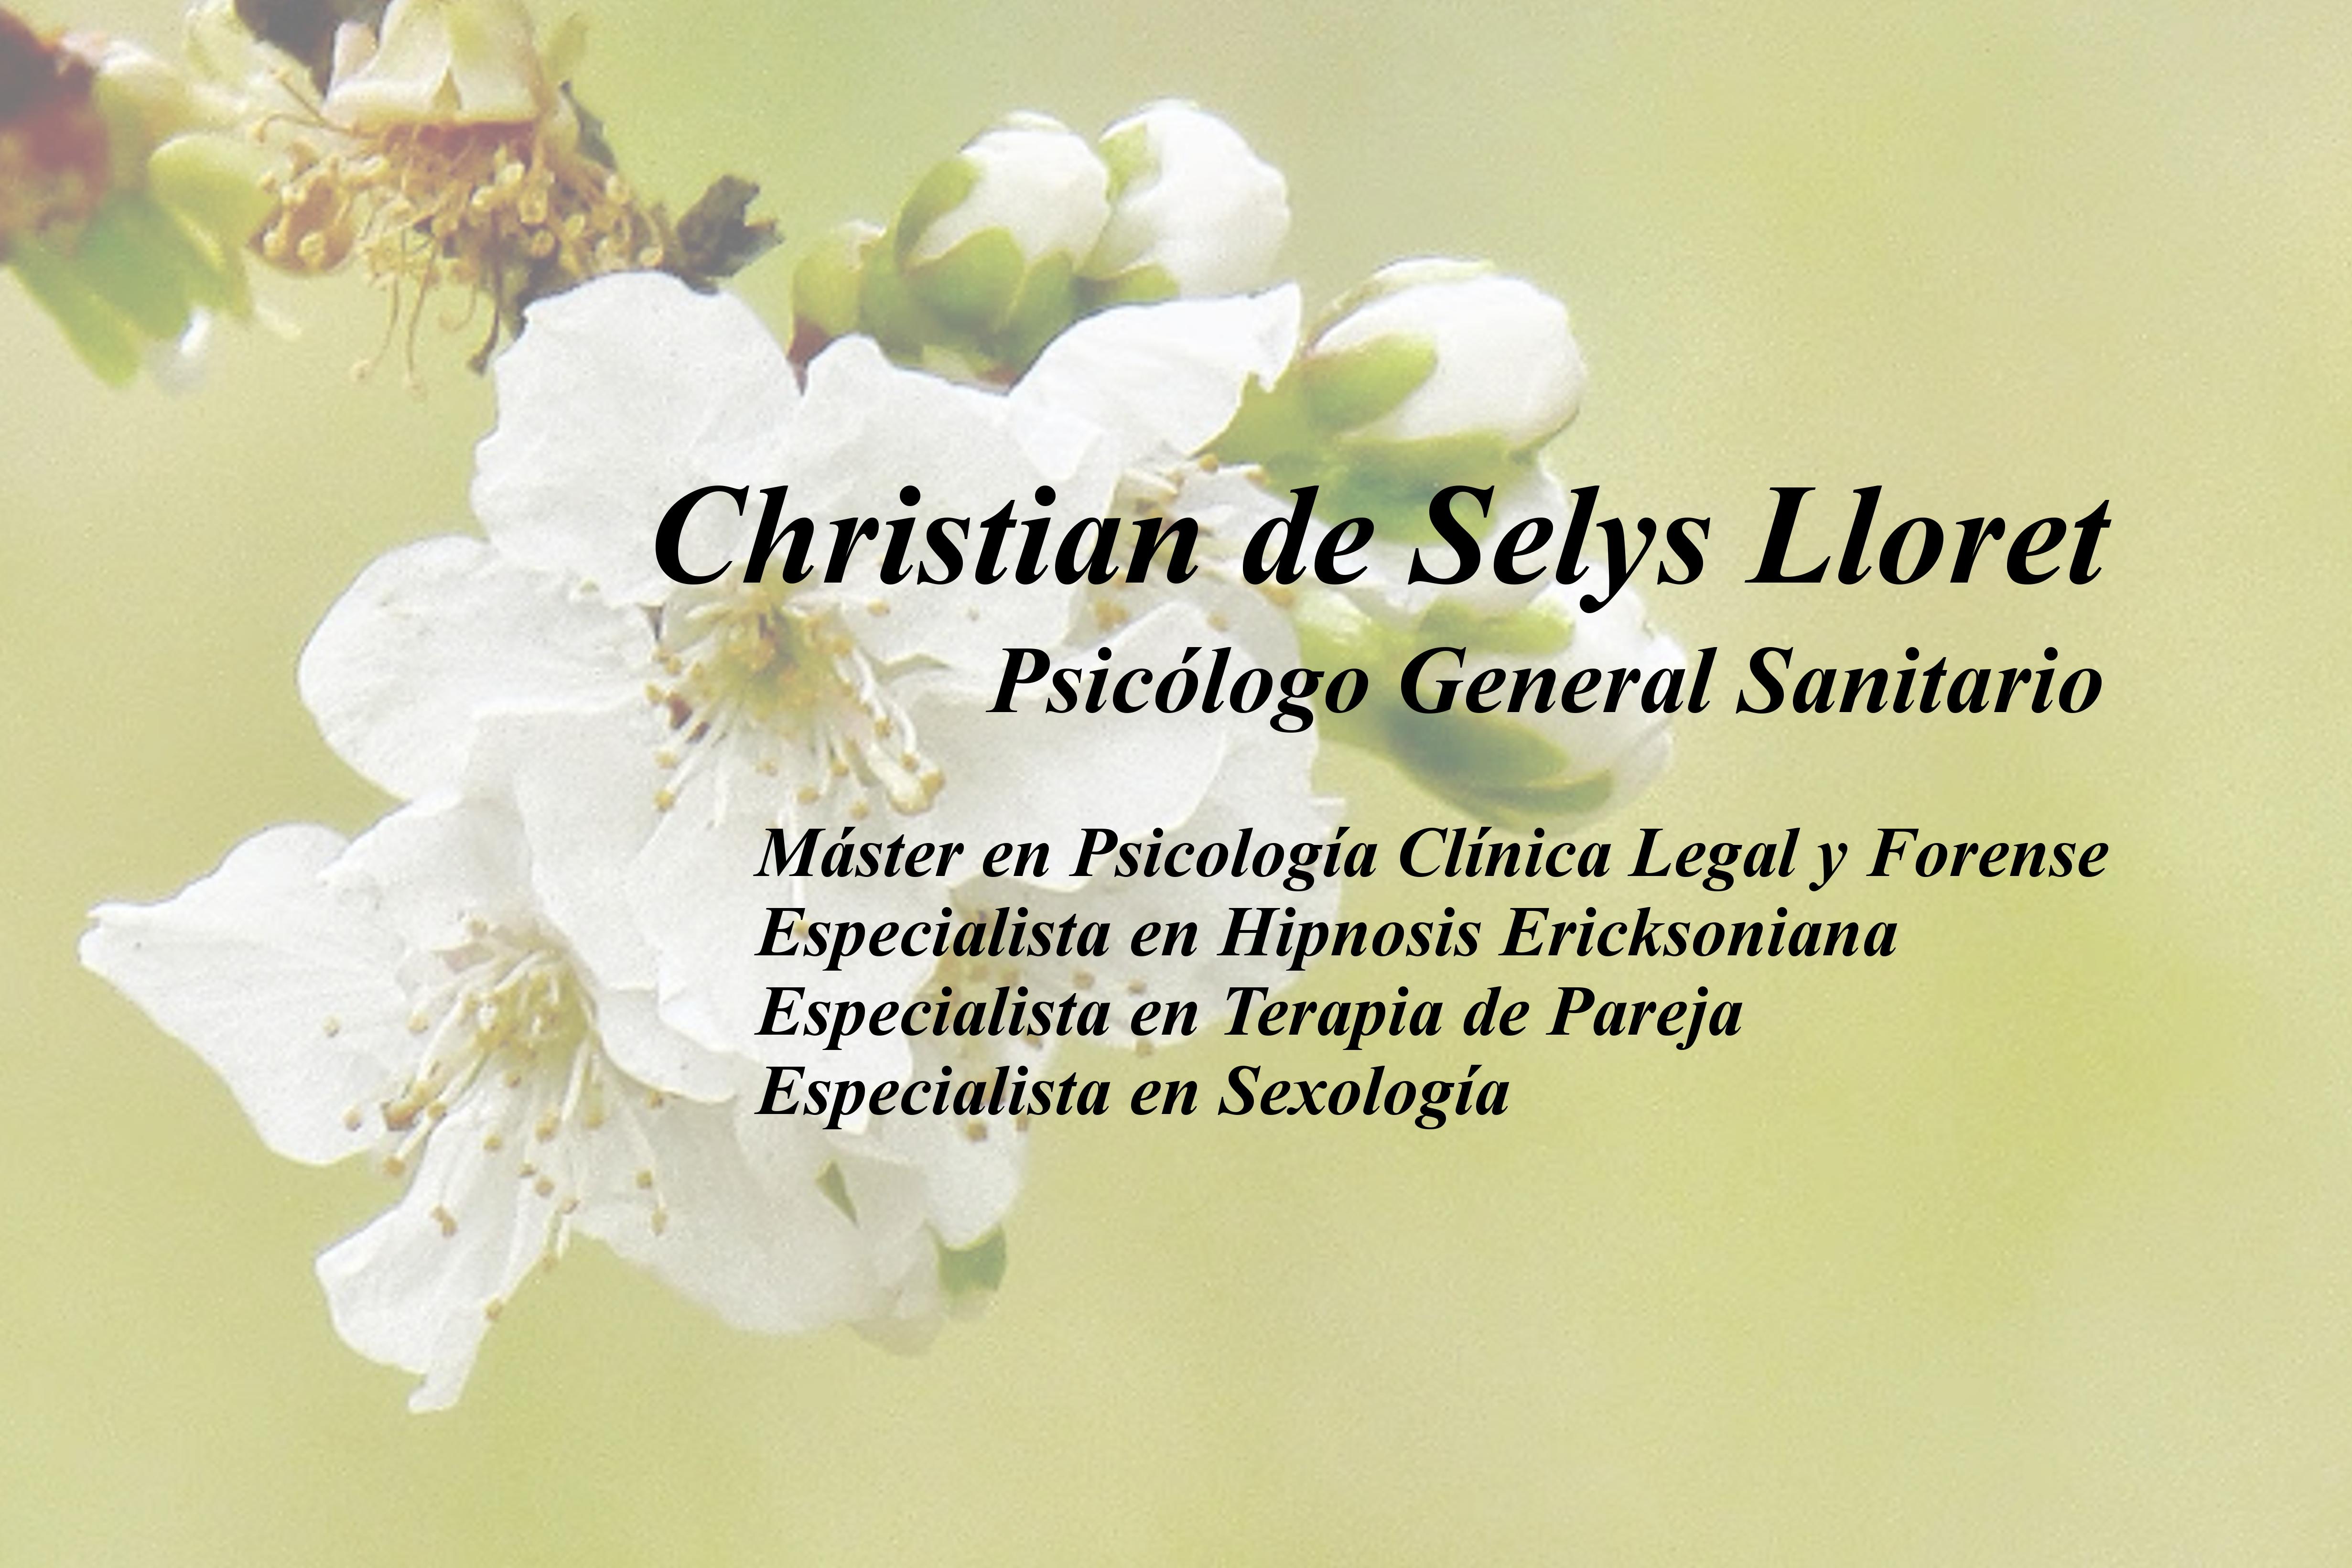 Christian de Selys